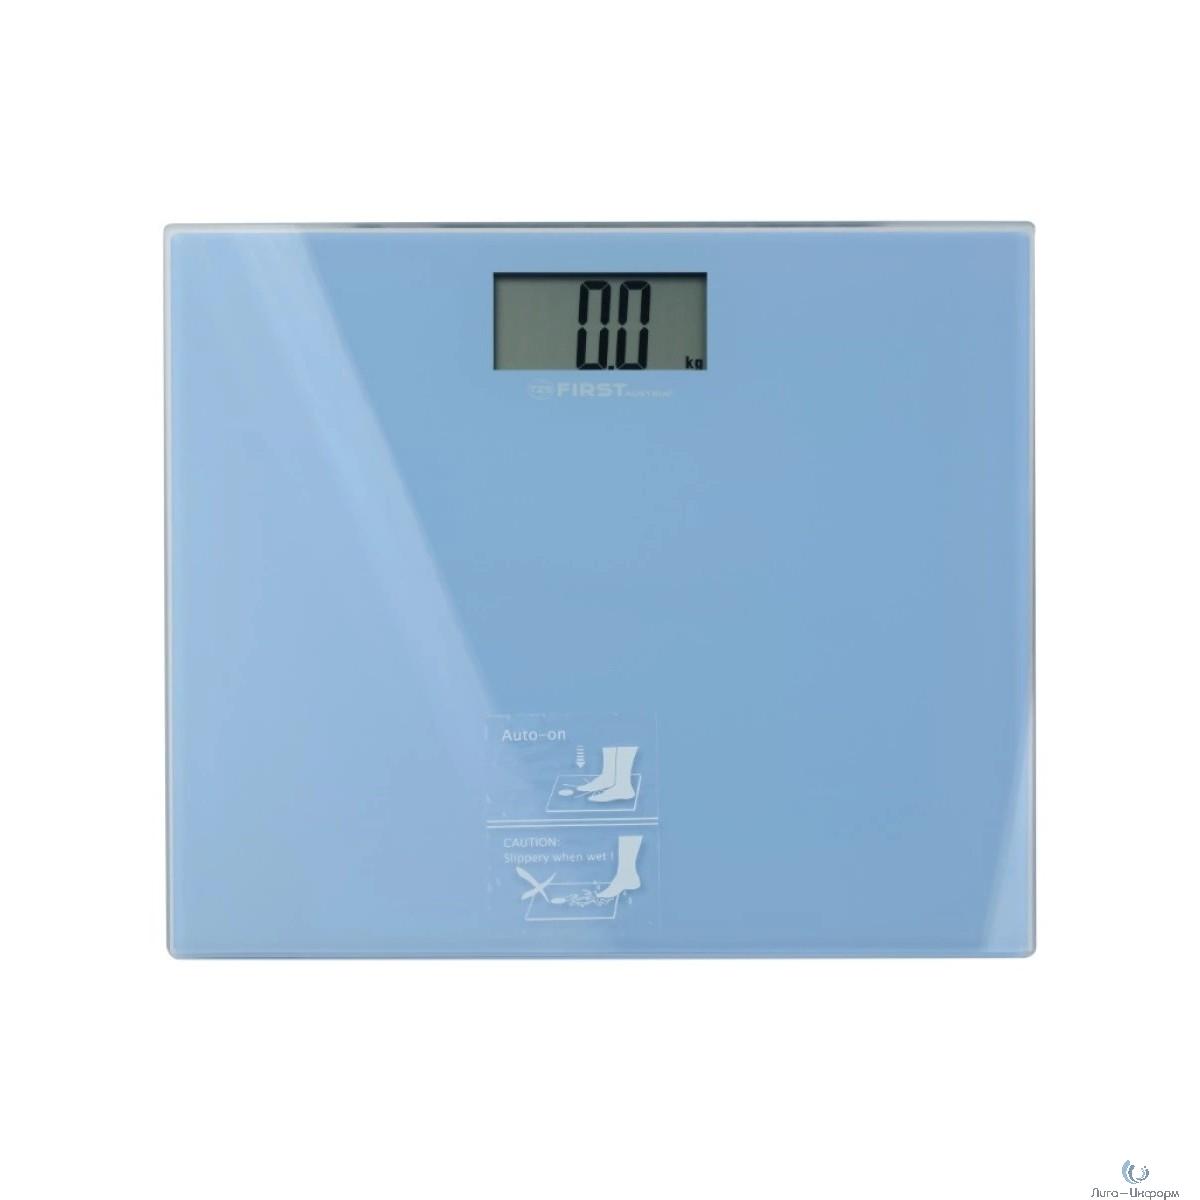 FIRST FA-8015-2-BL Весы напольные, электронные, ЖК-диспл., стекл. 6 мм, 150 кг, Градация: 100гр, серый.